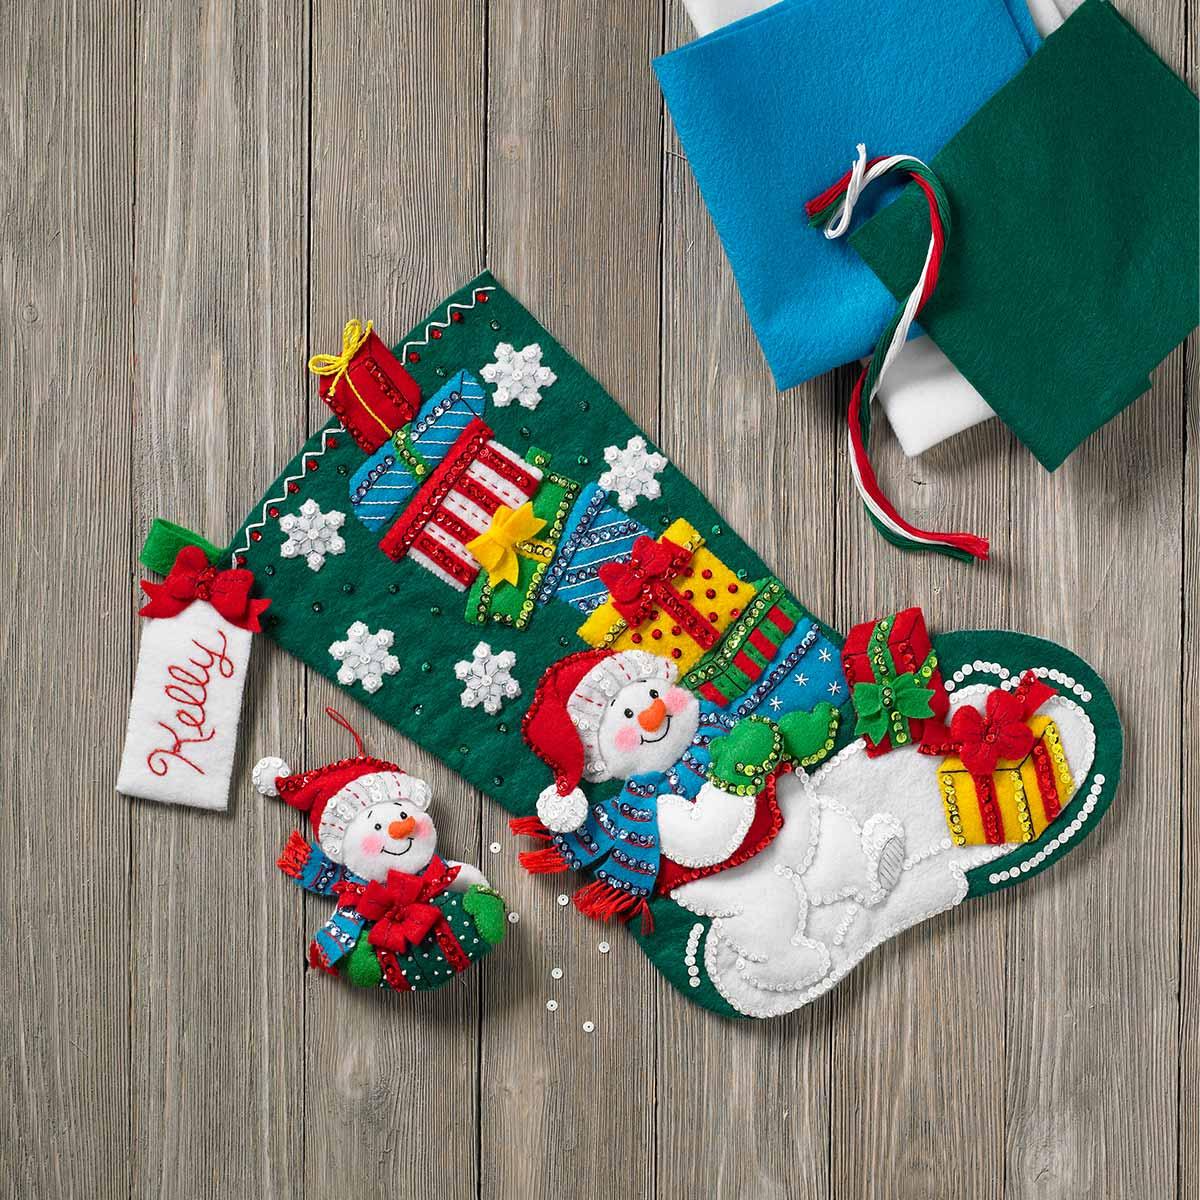 Bucilla ® Seasonal - Felt - Stocking Kits - Snowman With Presents - 86864